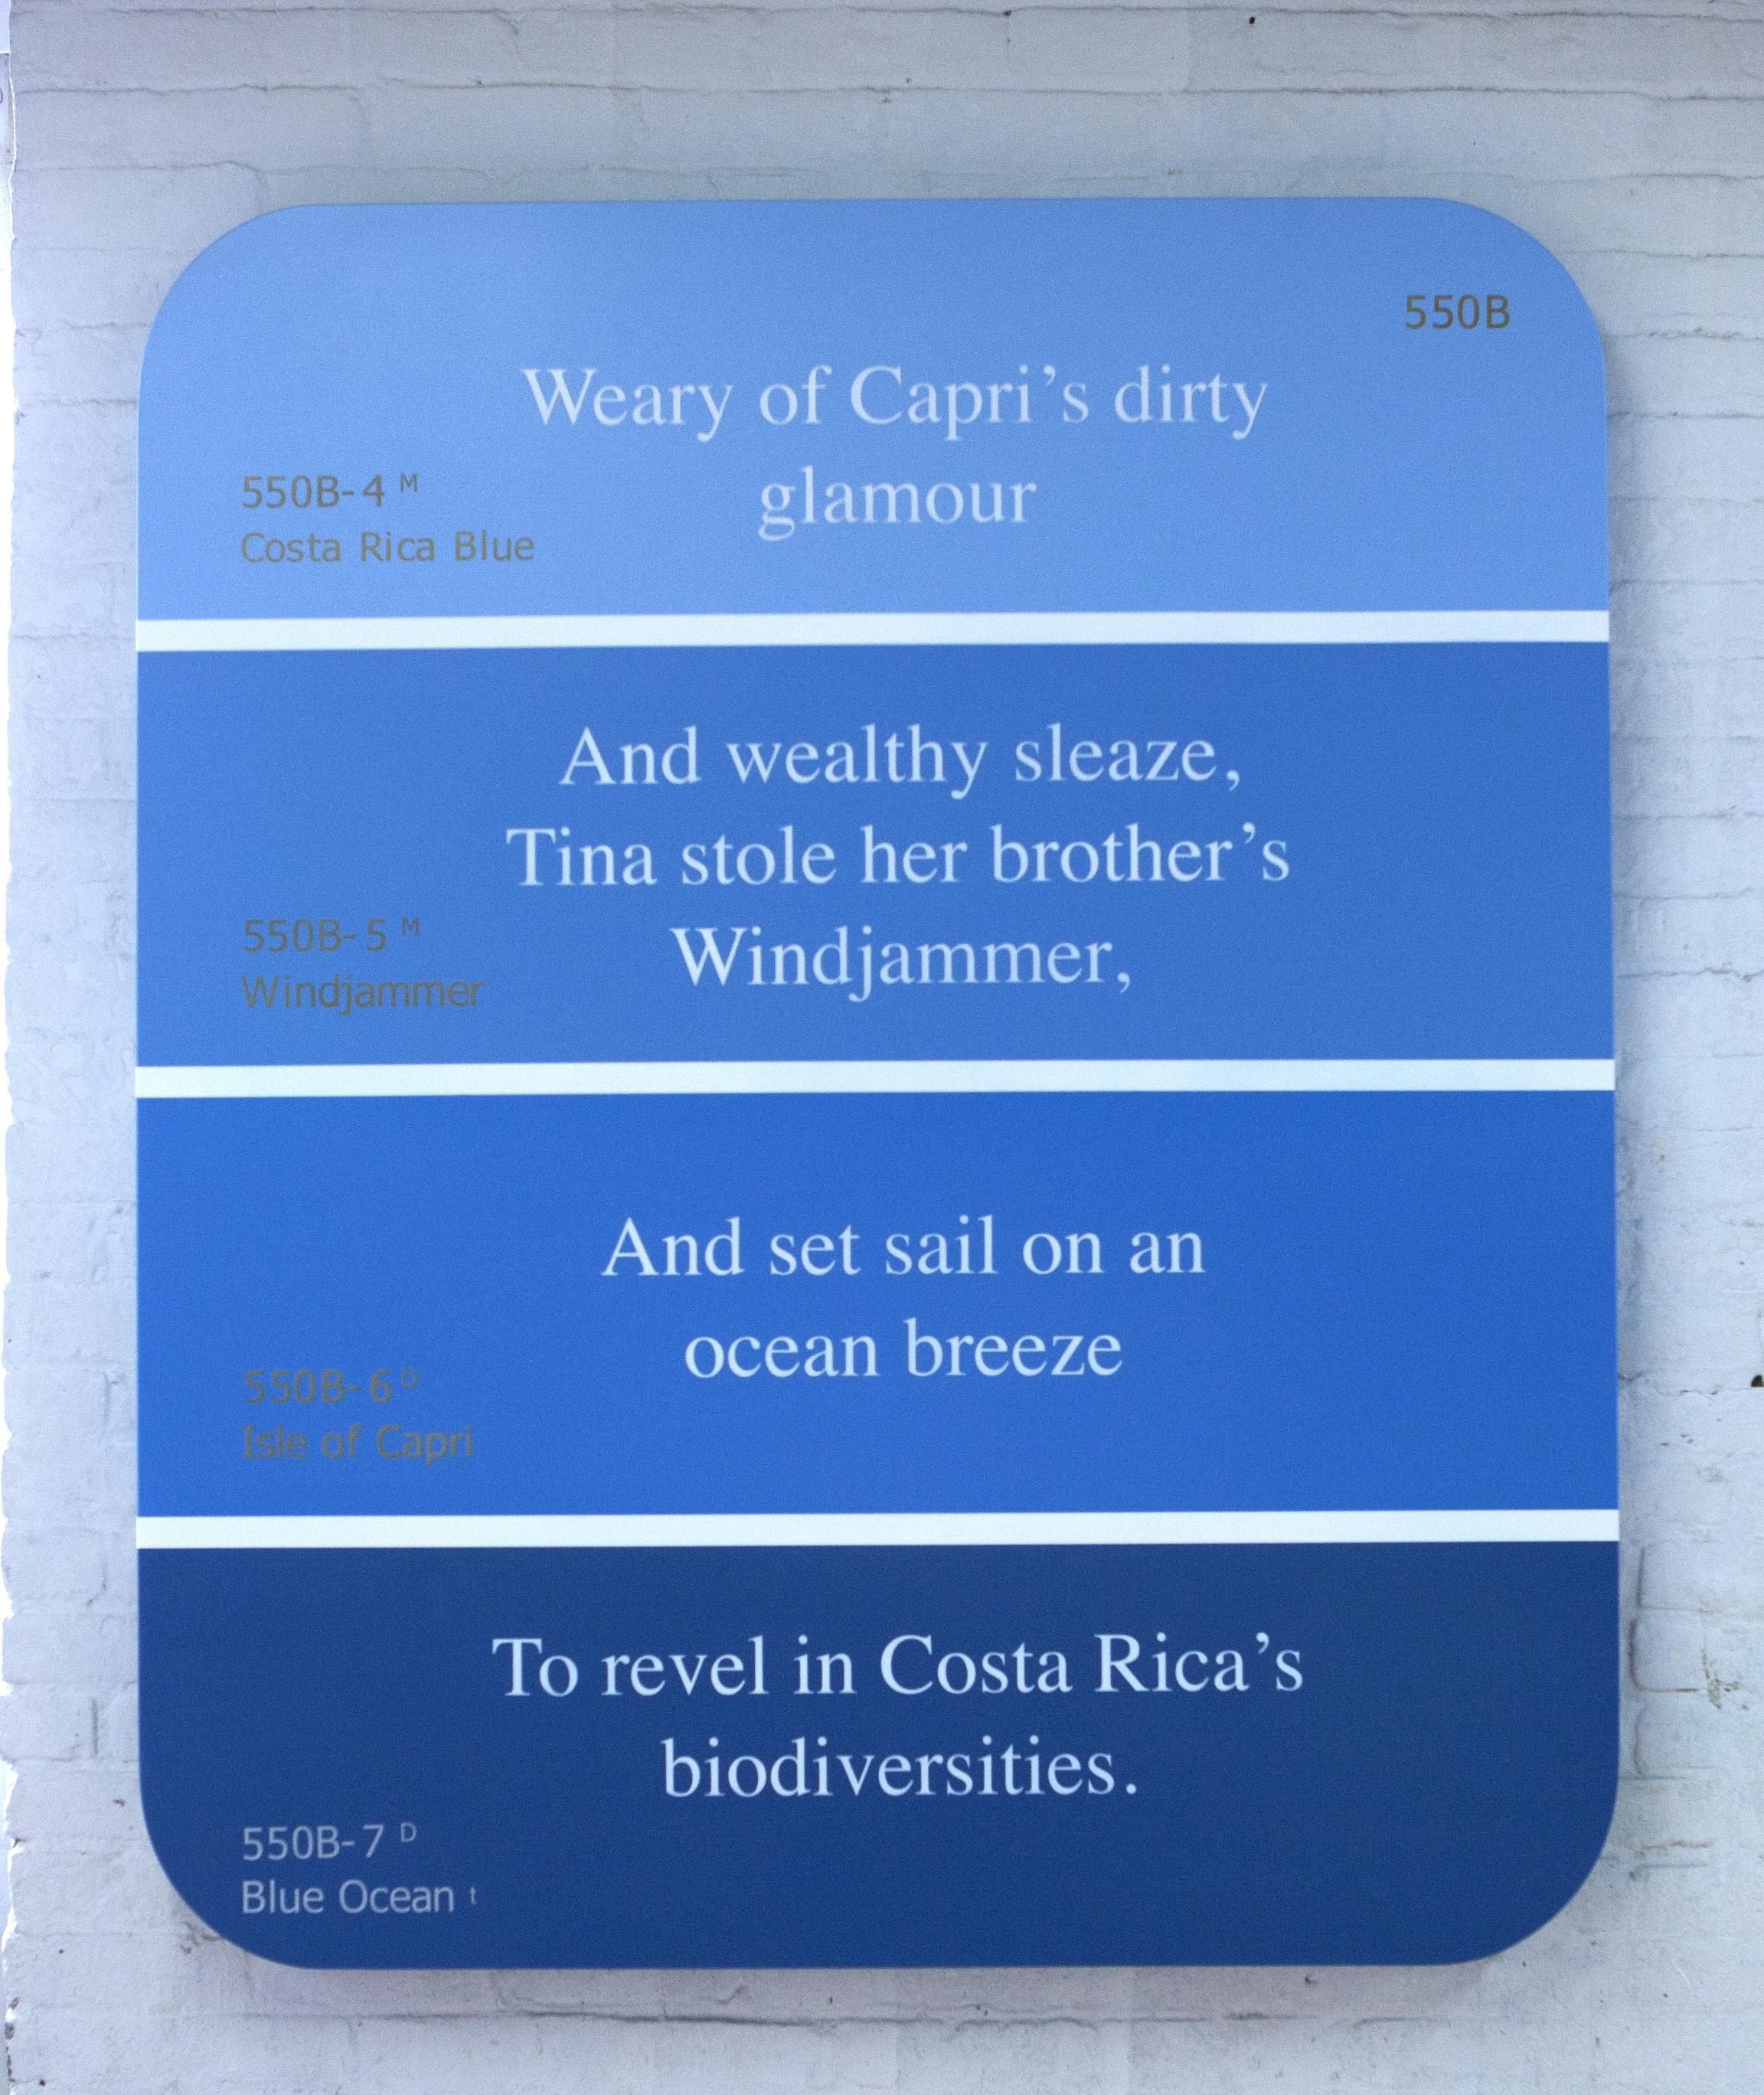 Costa Rica Blue, Windjammer, Isle of Capri, Blue Ocean